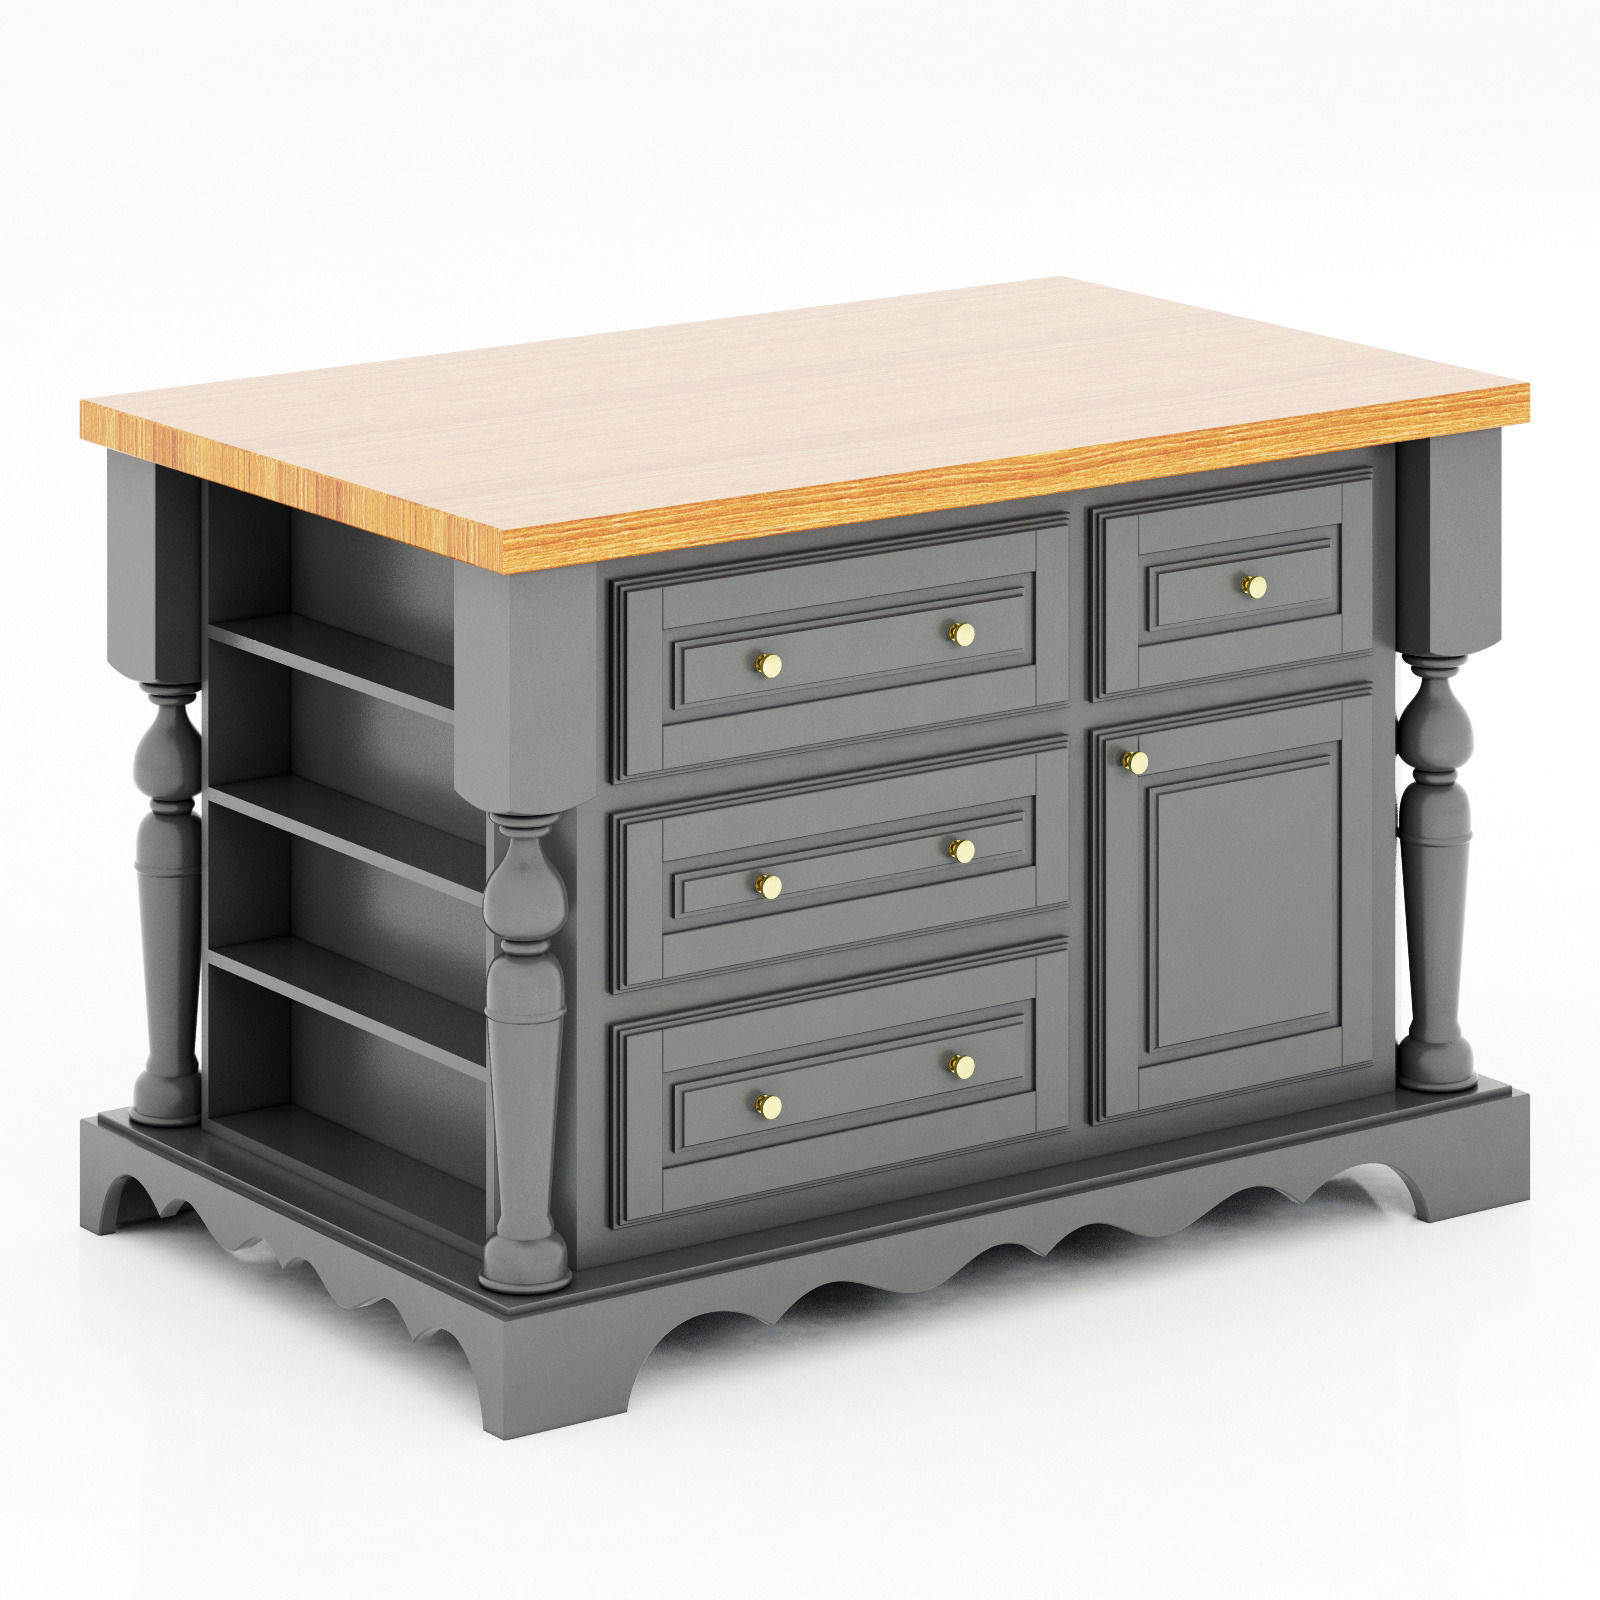 Lyn Design Kitchen Island Model